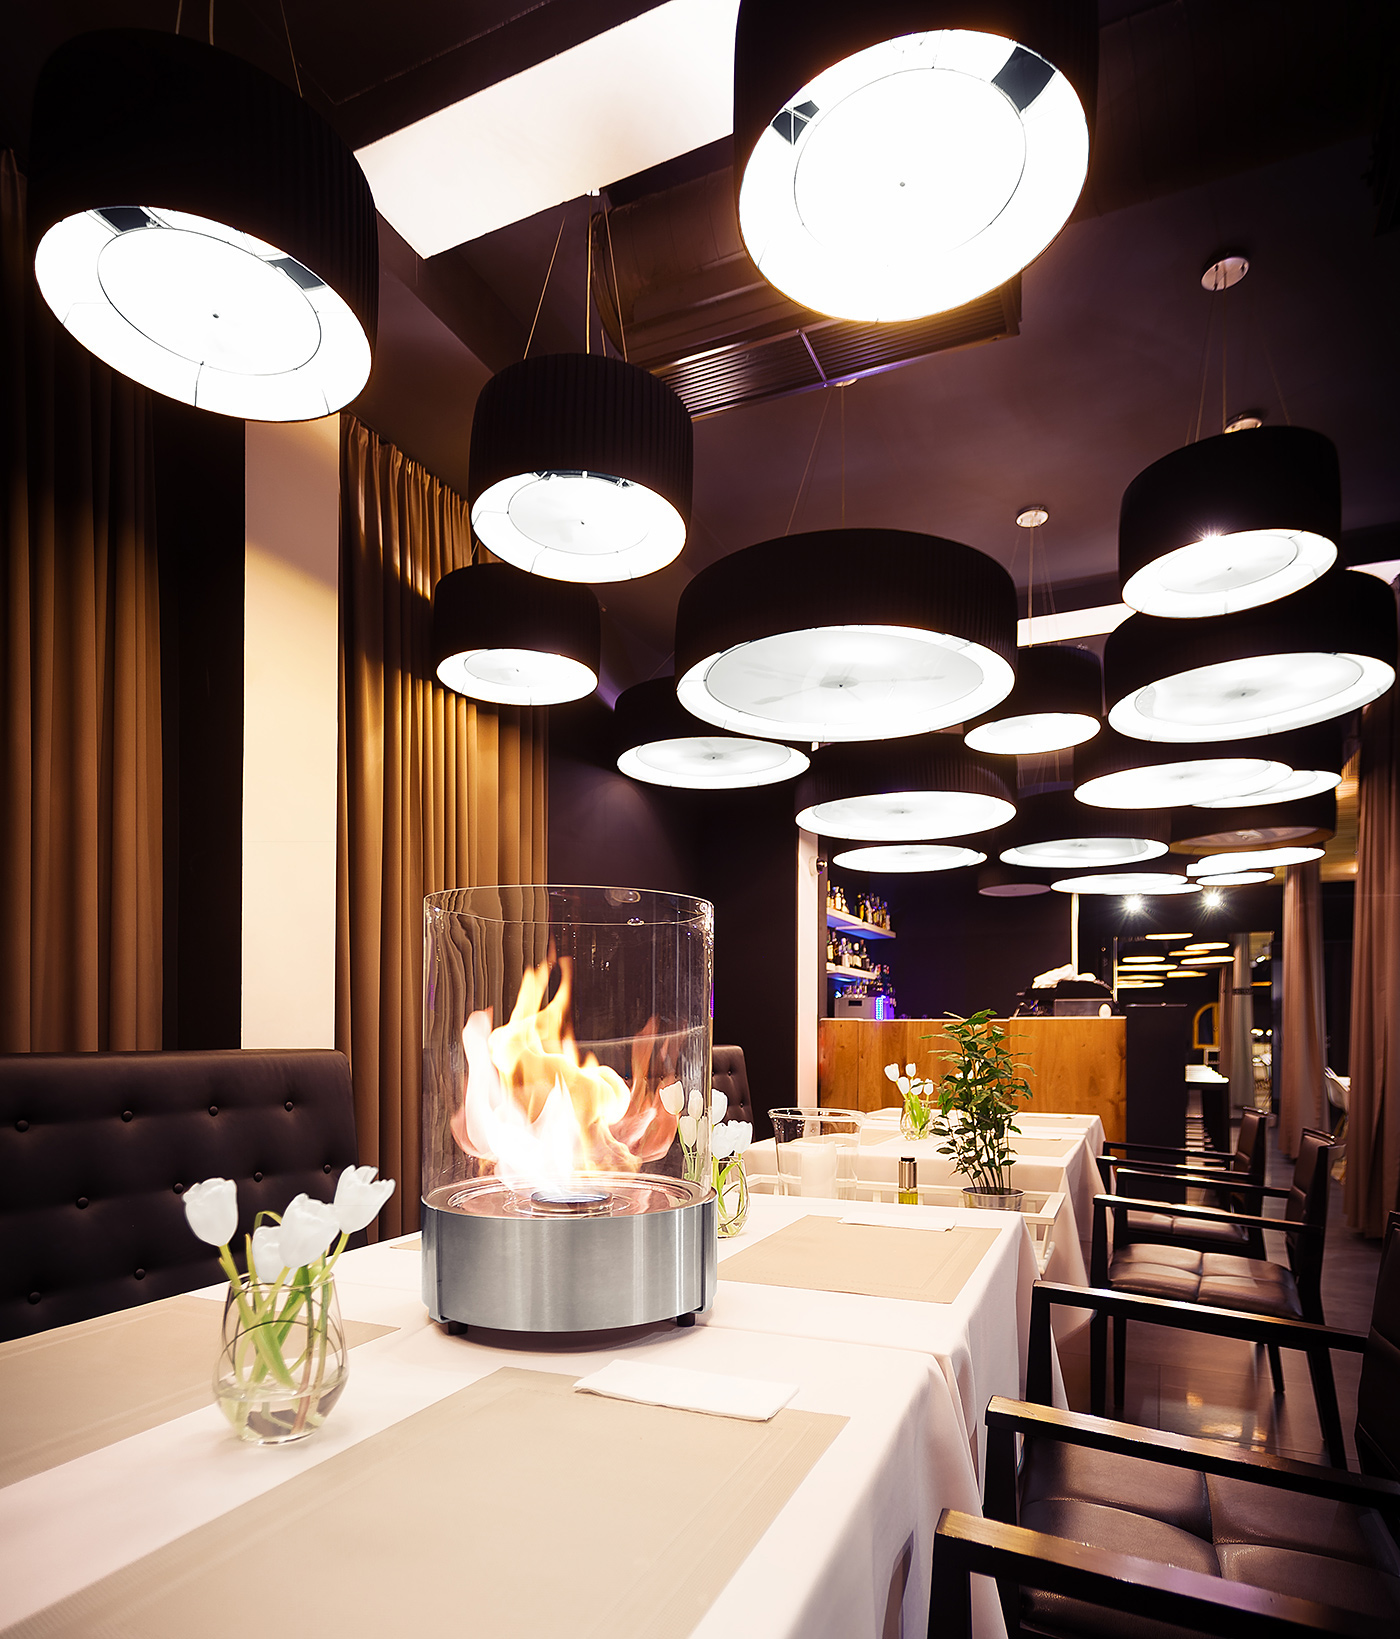 fireplaces Planika restaurant hotel Spa zen bar kumi studio kugi Simple Commerce fire line automatic